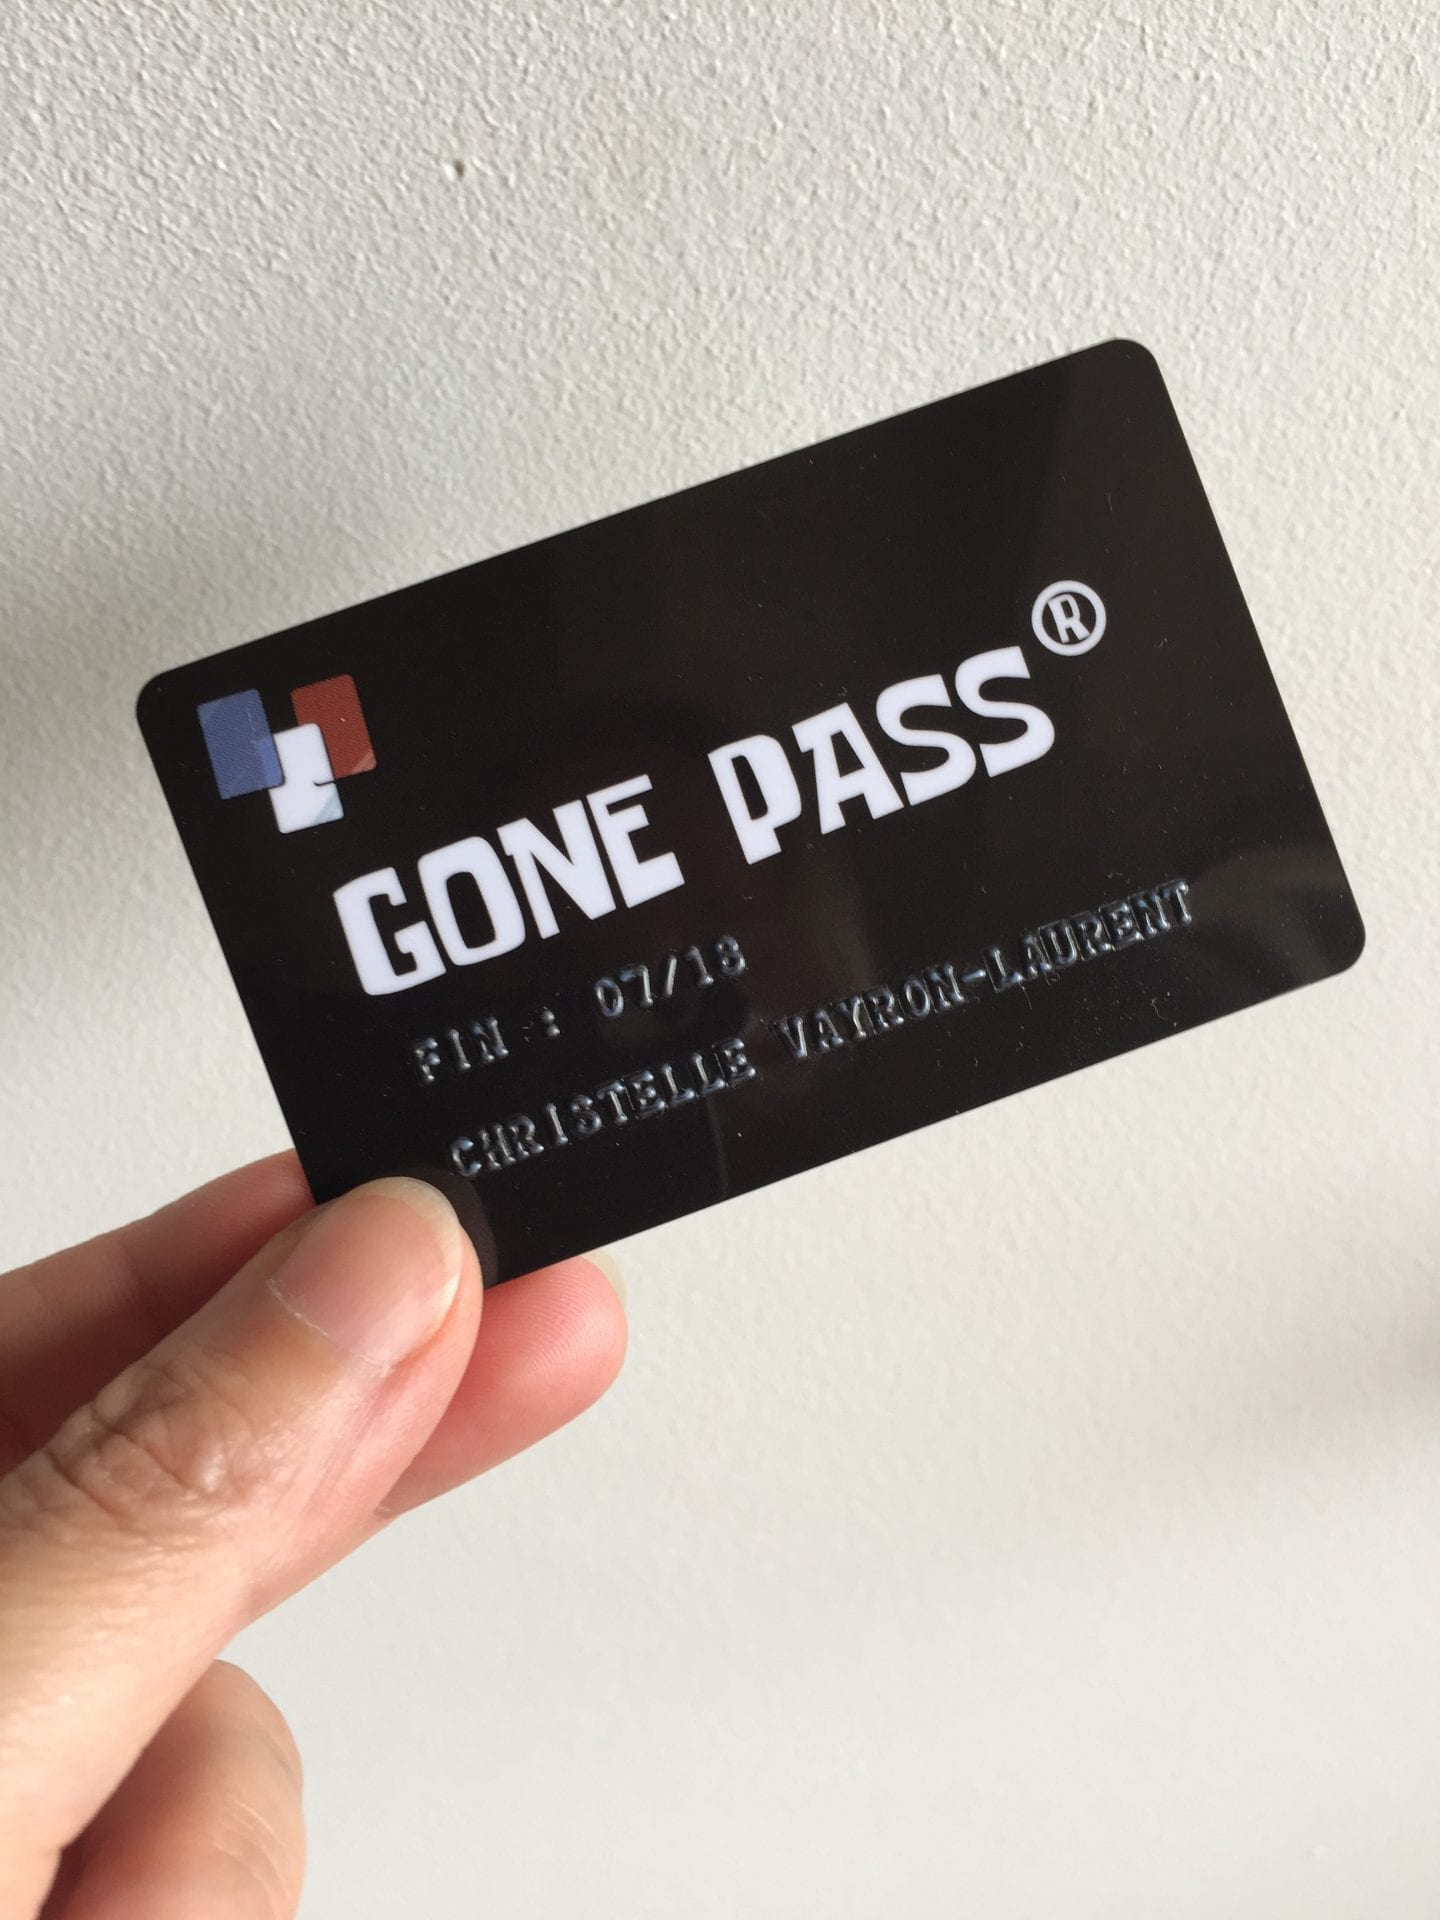 Gonne Pass Blogueuse lyonnaise